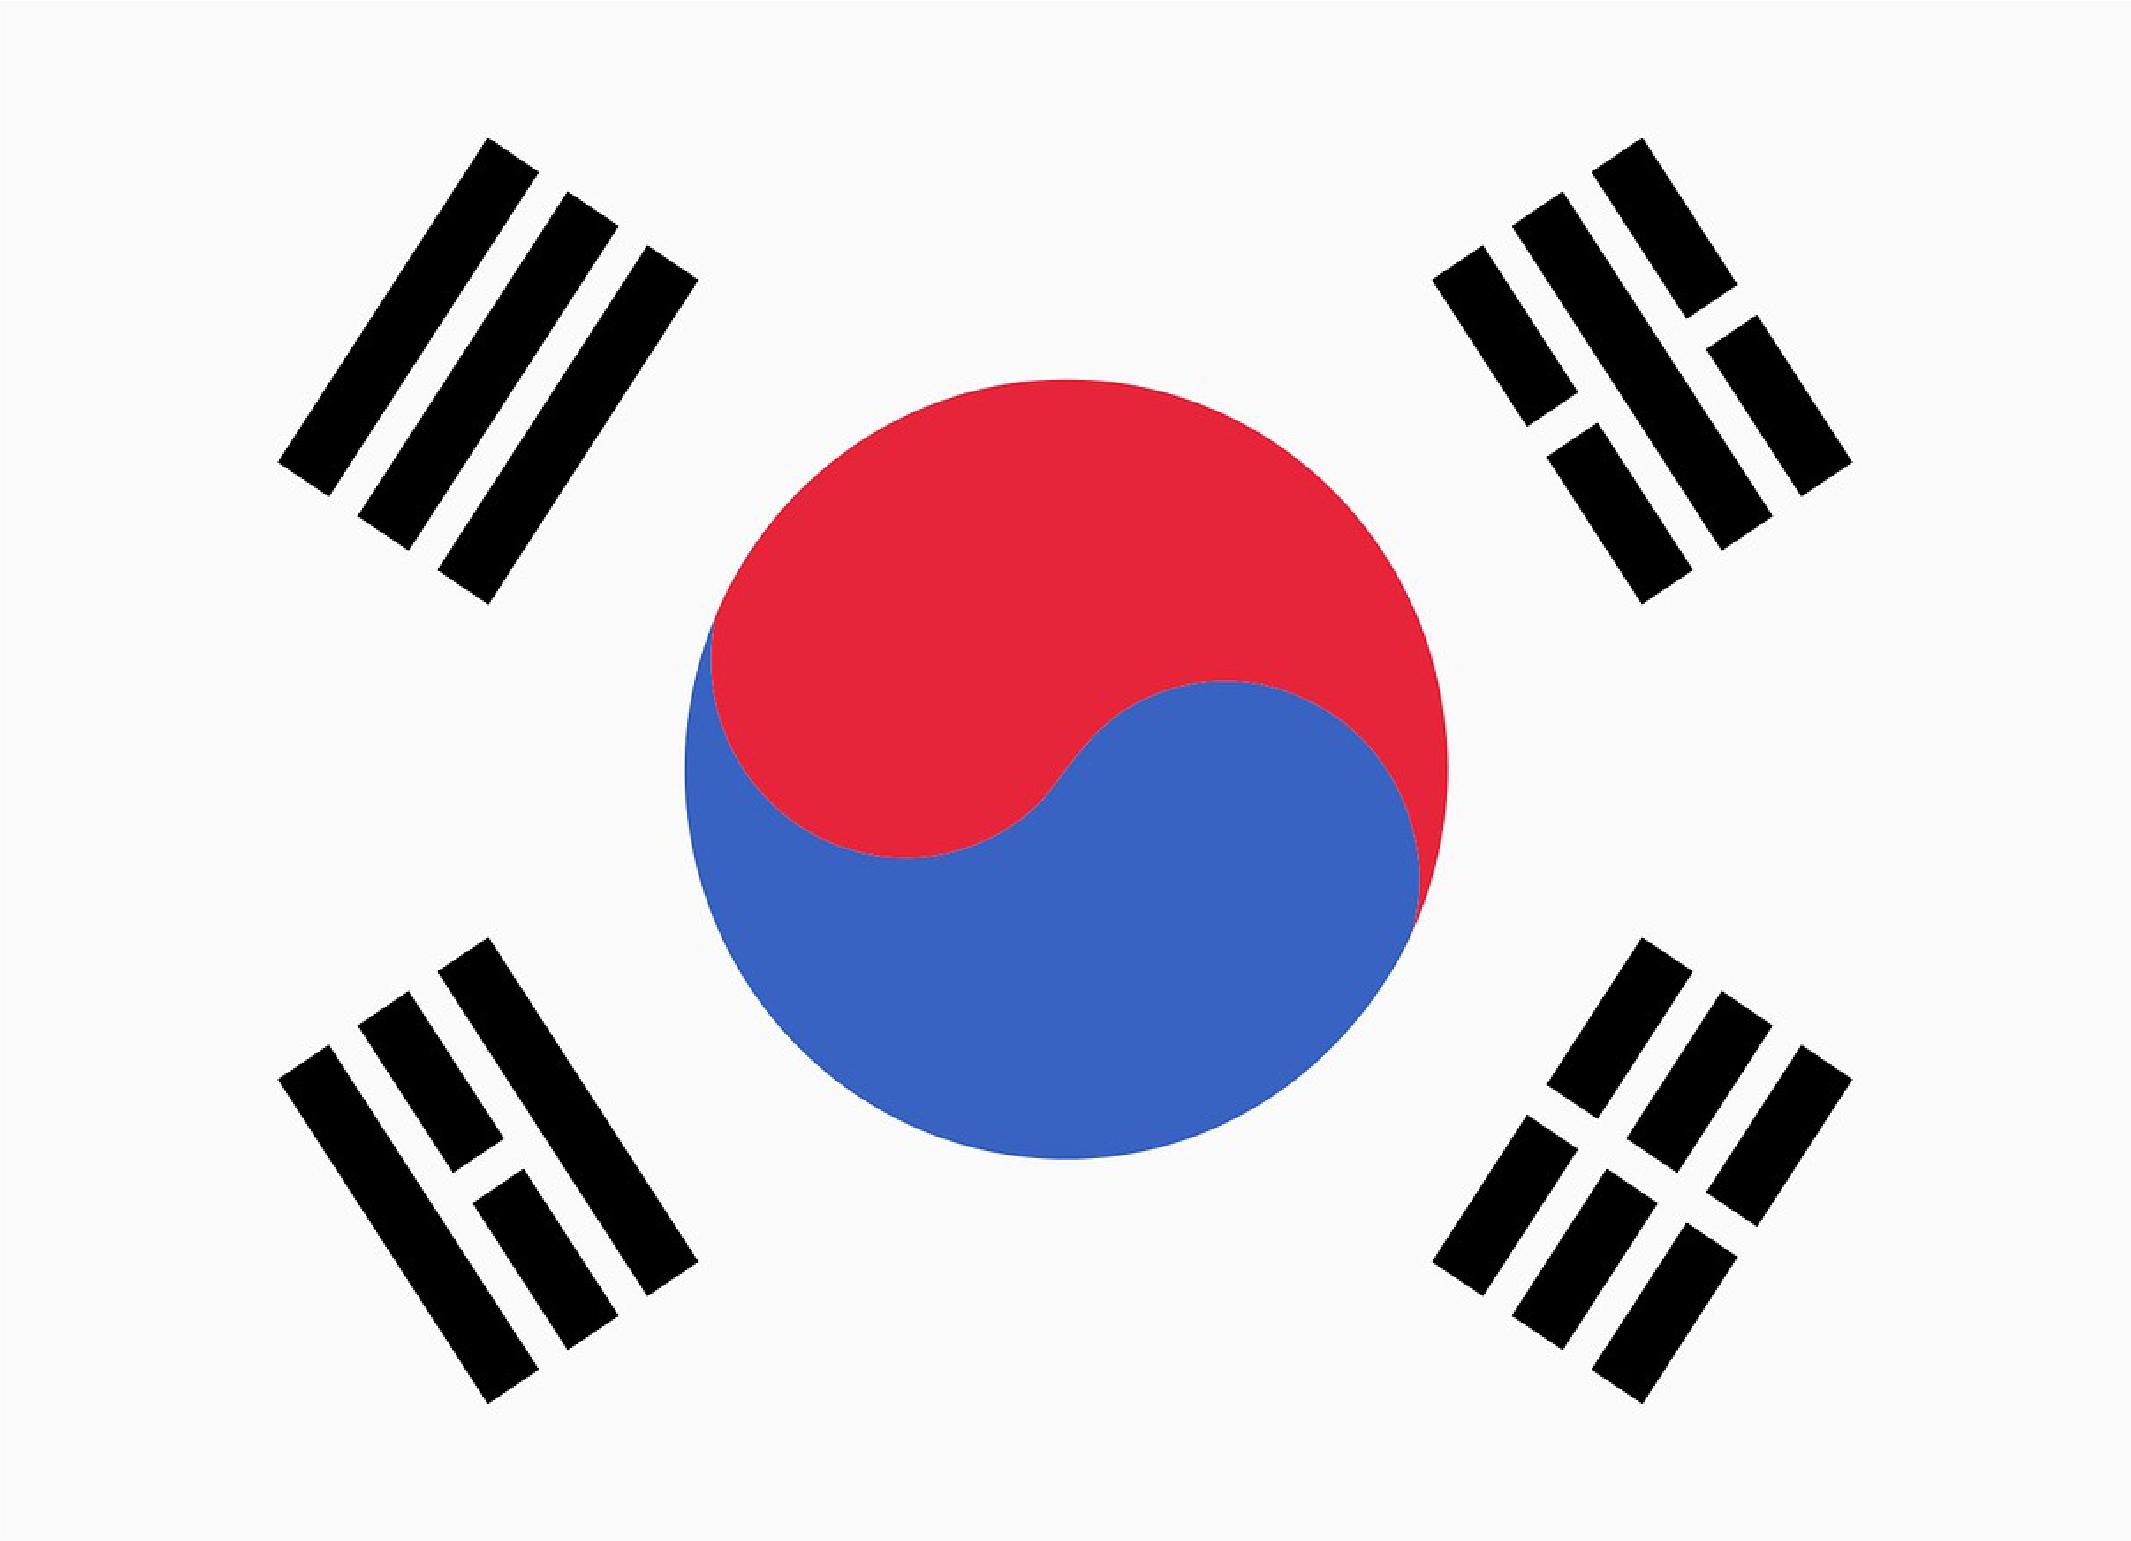 【JOY霸氣】韓國霸氣首釜愛寶樂園溜溜車海鮮吃到飽五日